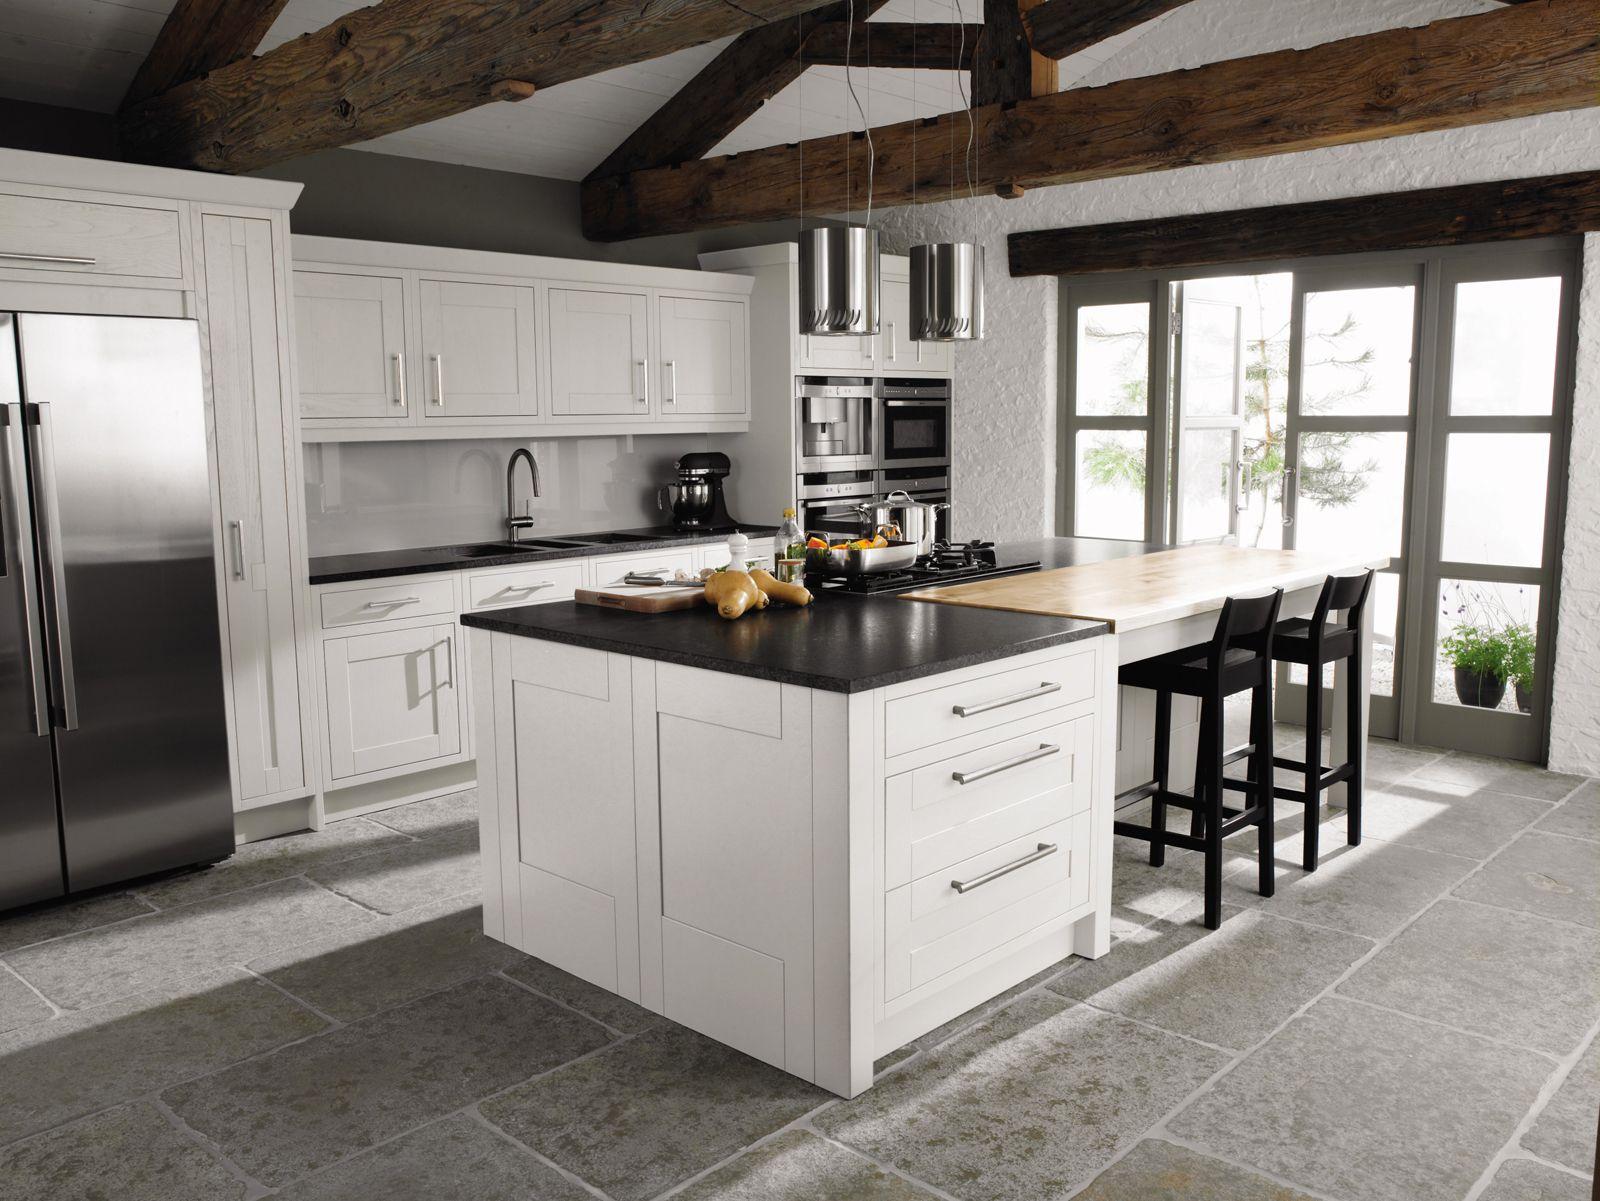 Kitchens Mark III Construction Classic kitchen design